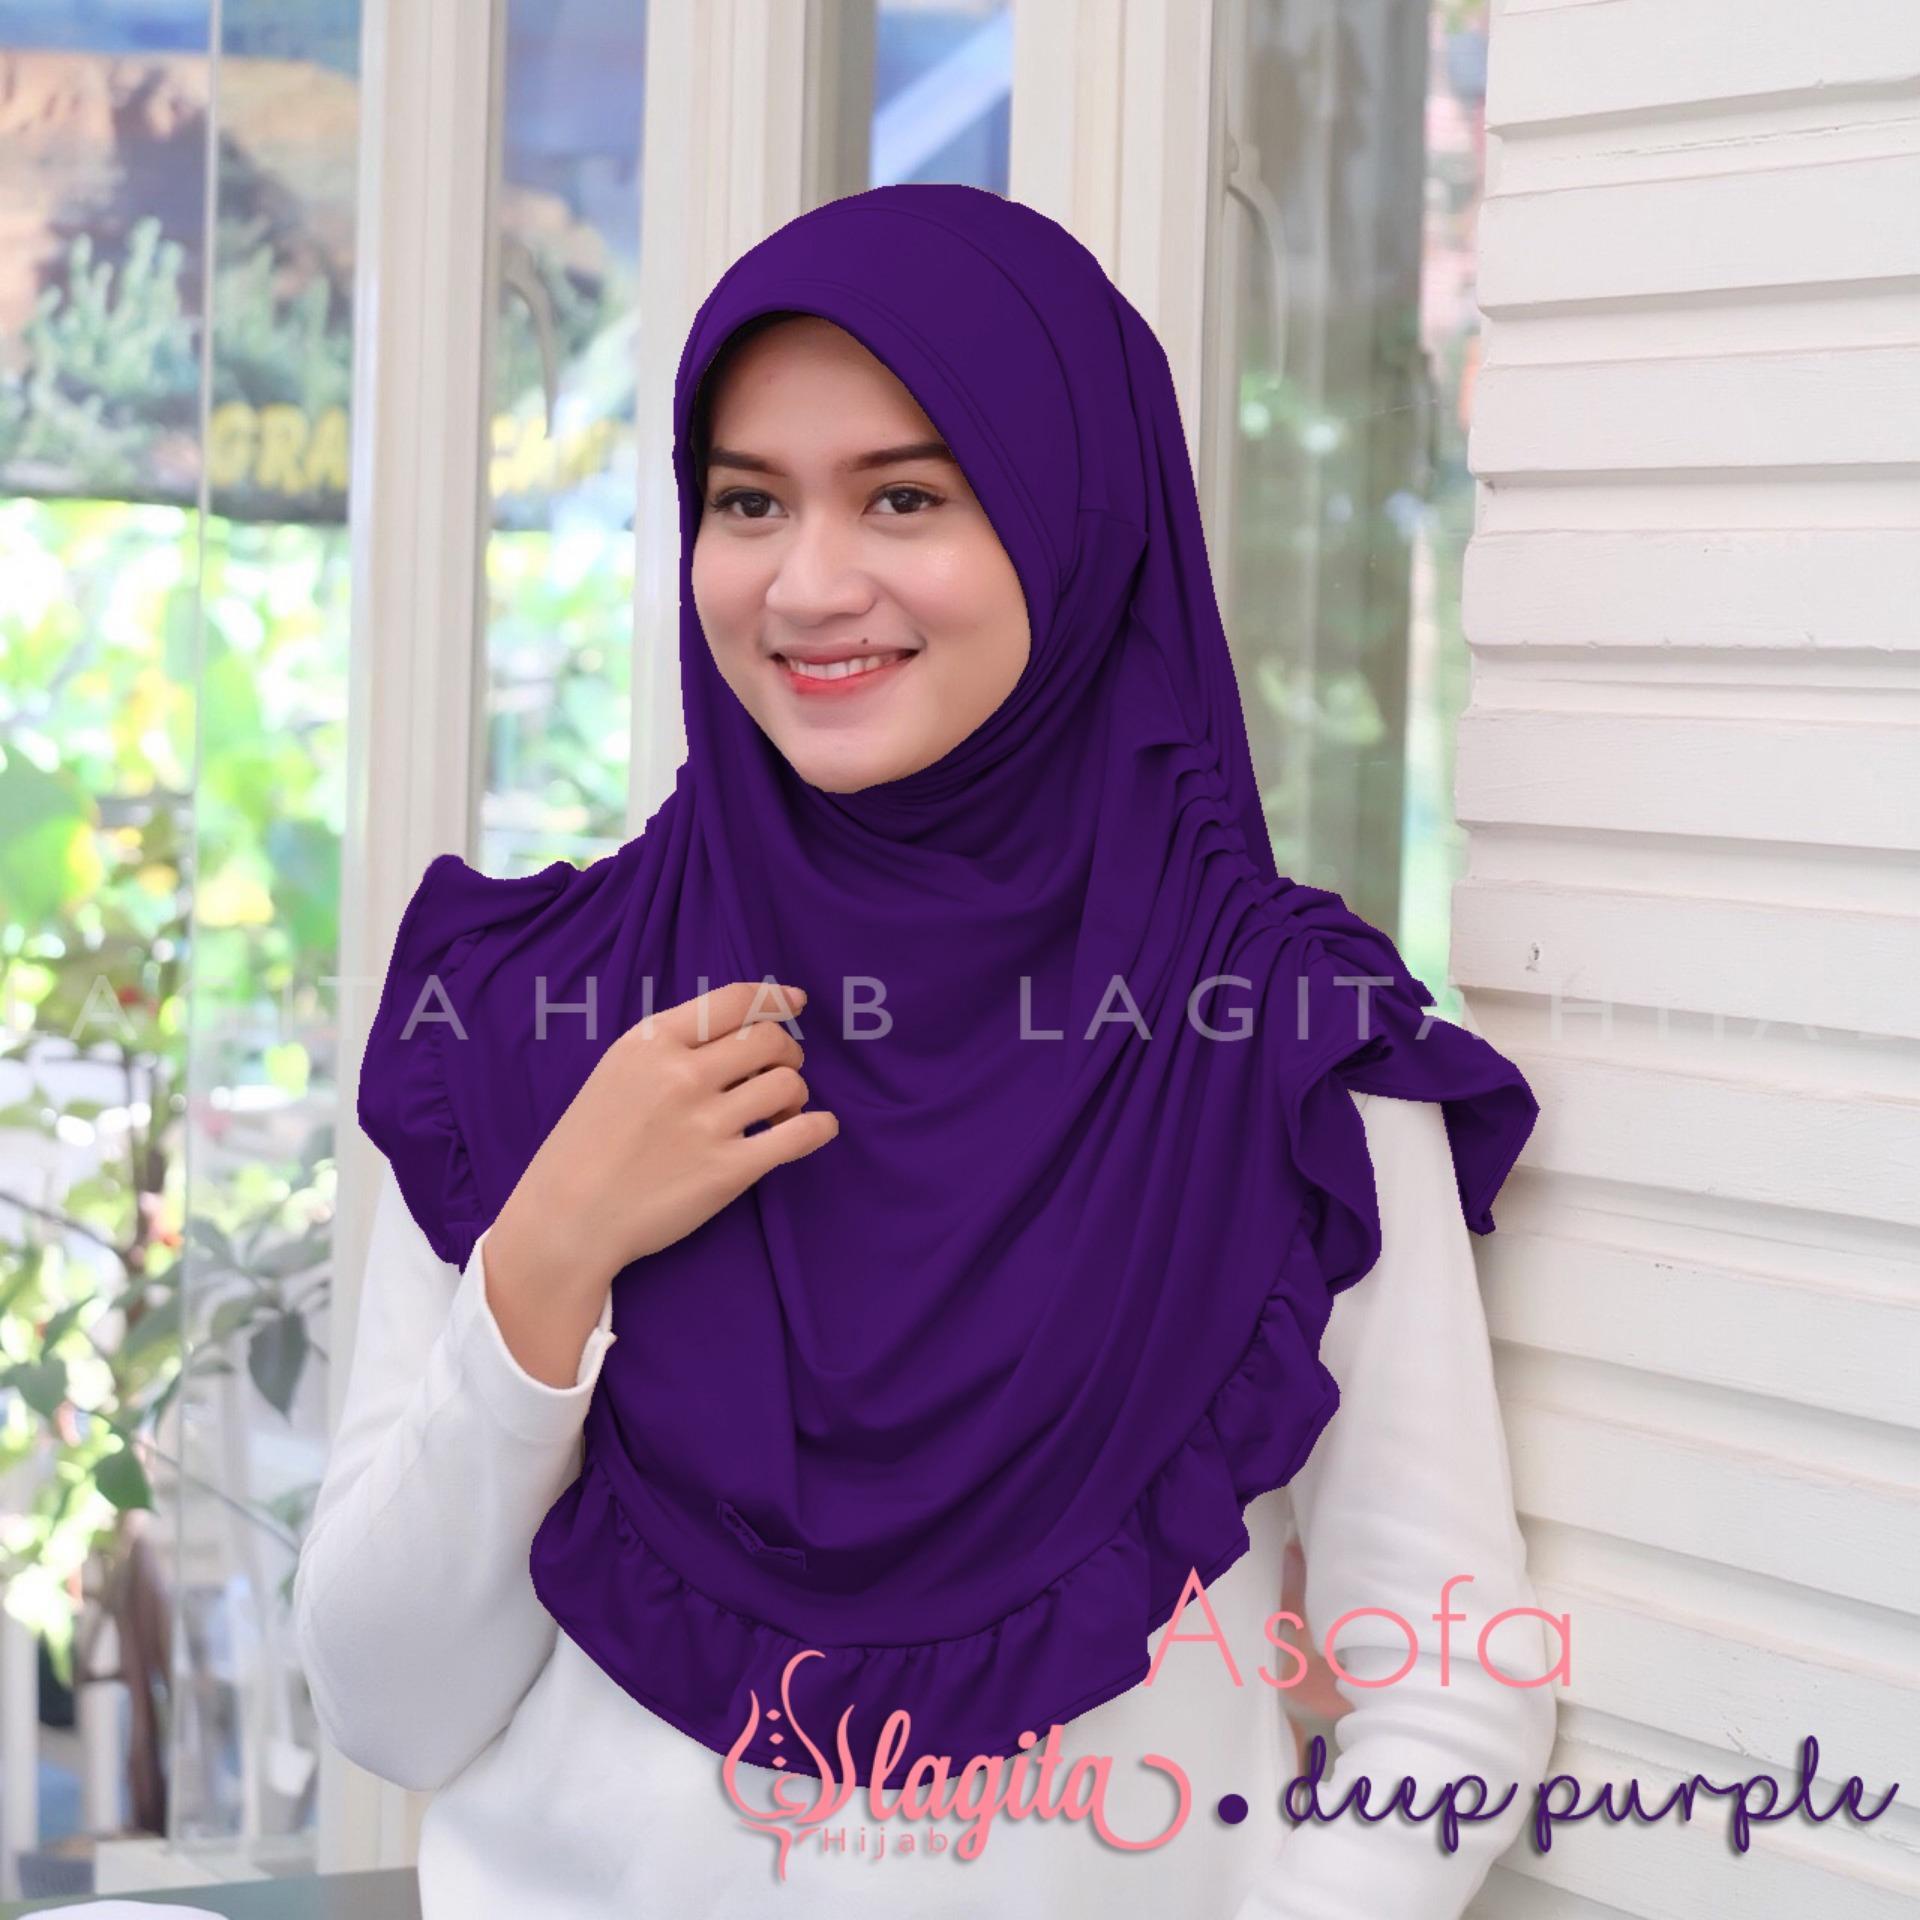 Lagita Hijab Asofa Kerudung Instan - ungu